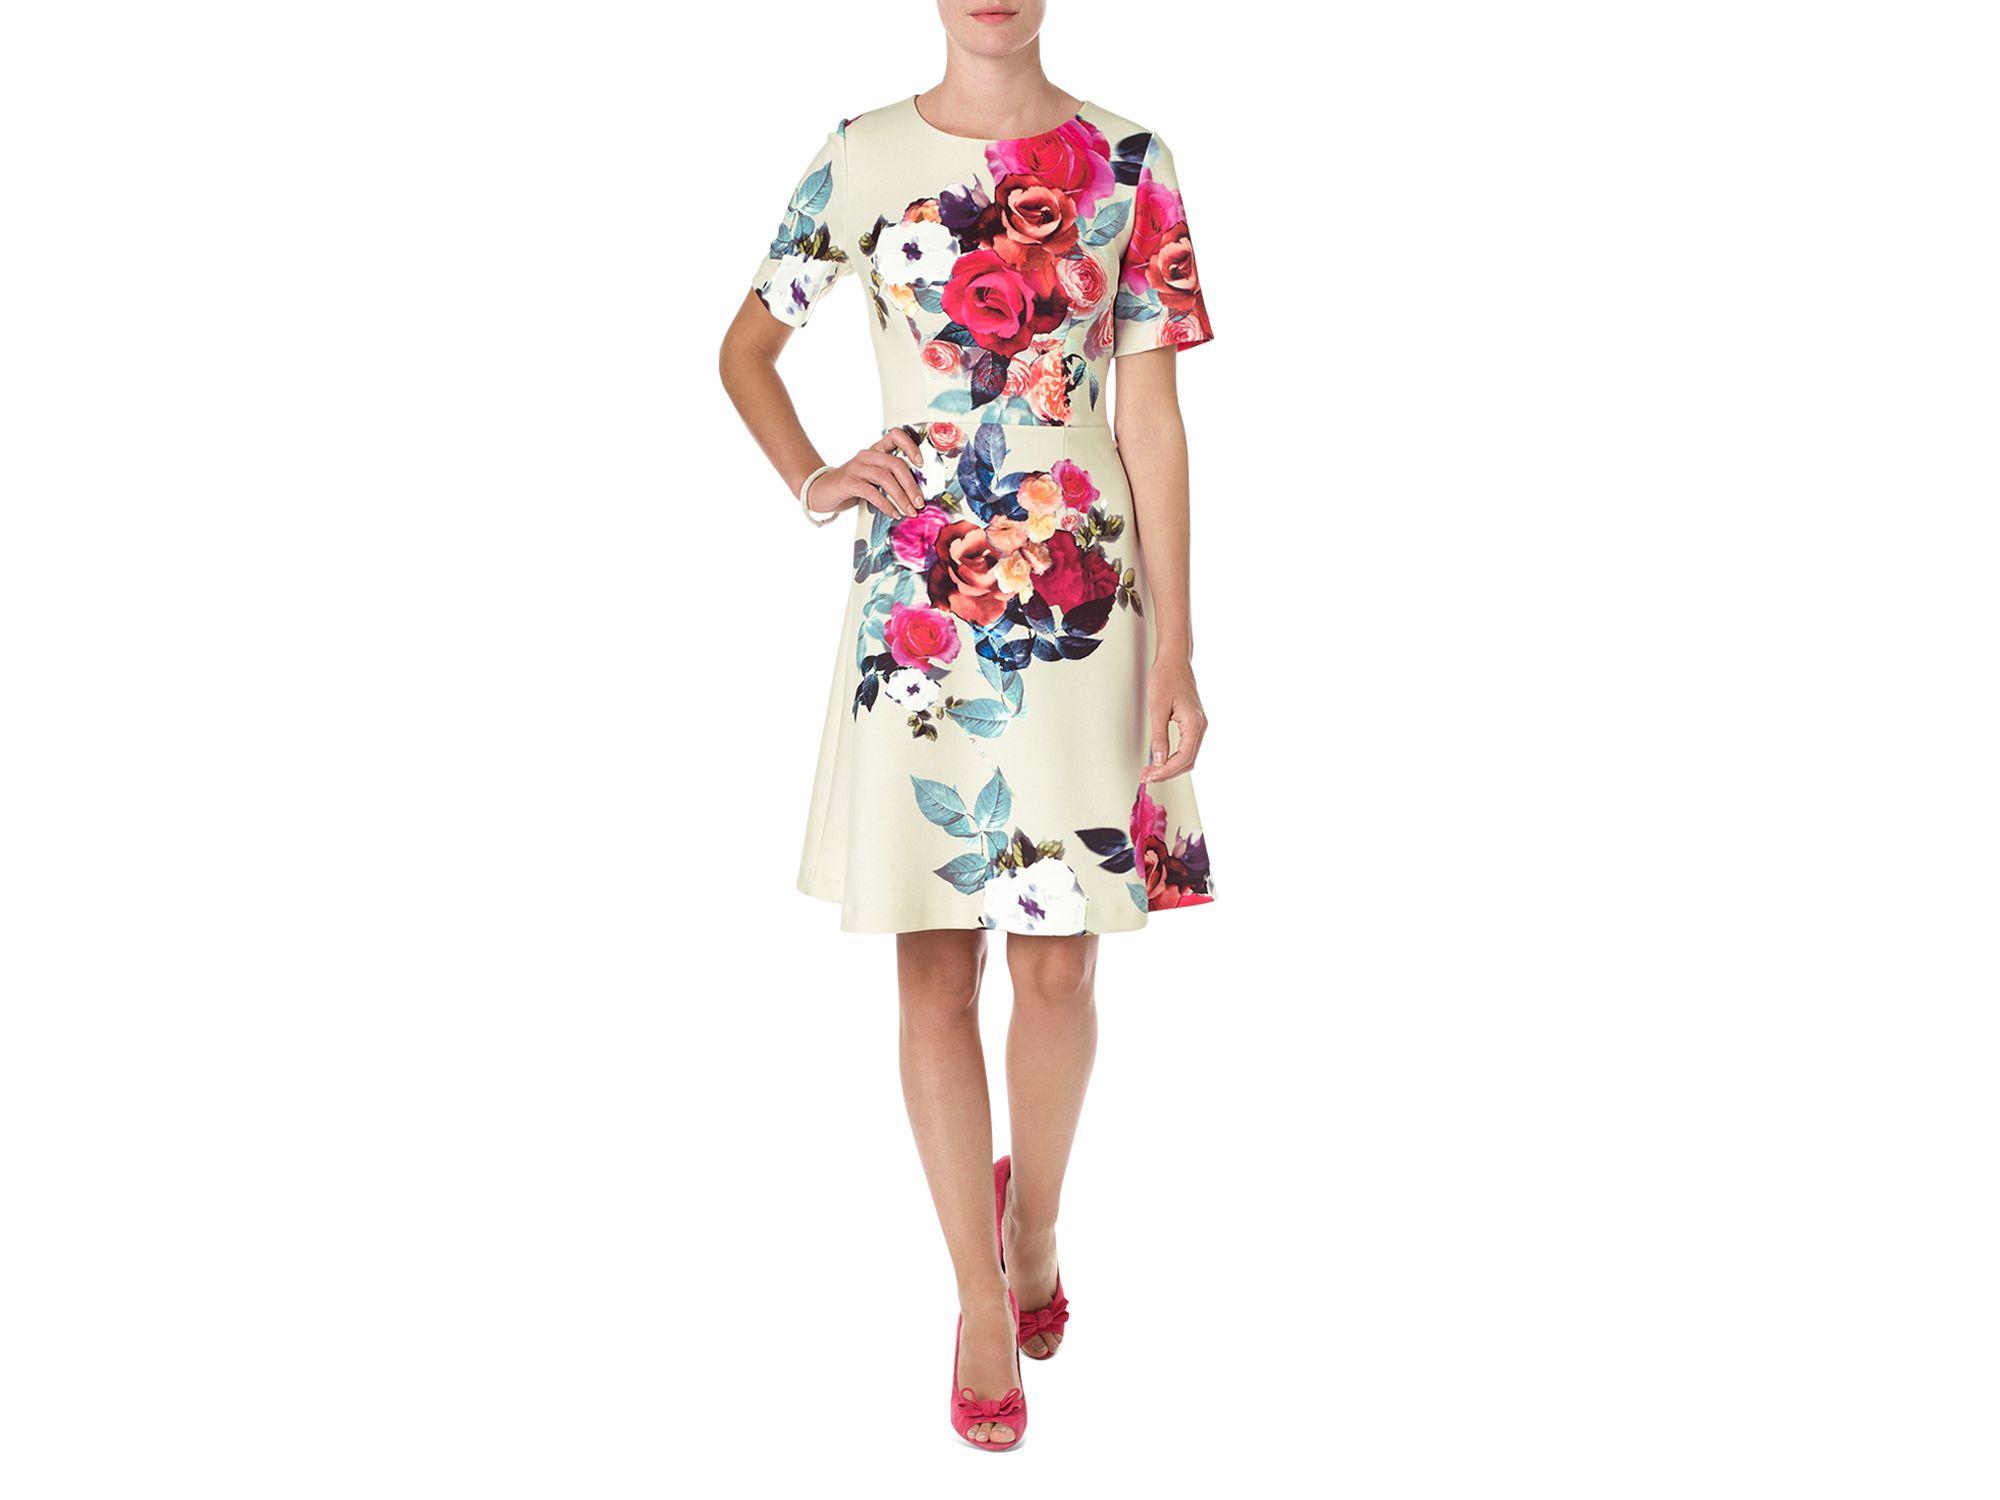 Lyst - Phase Eight Aurora Floral Dress